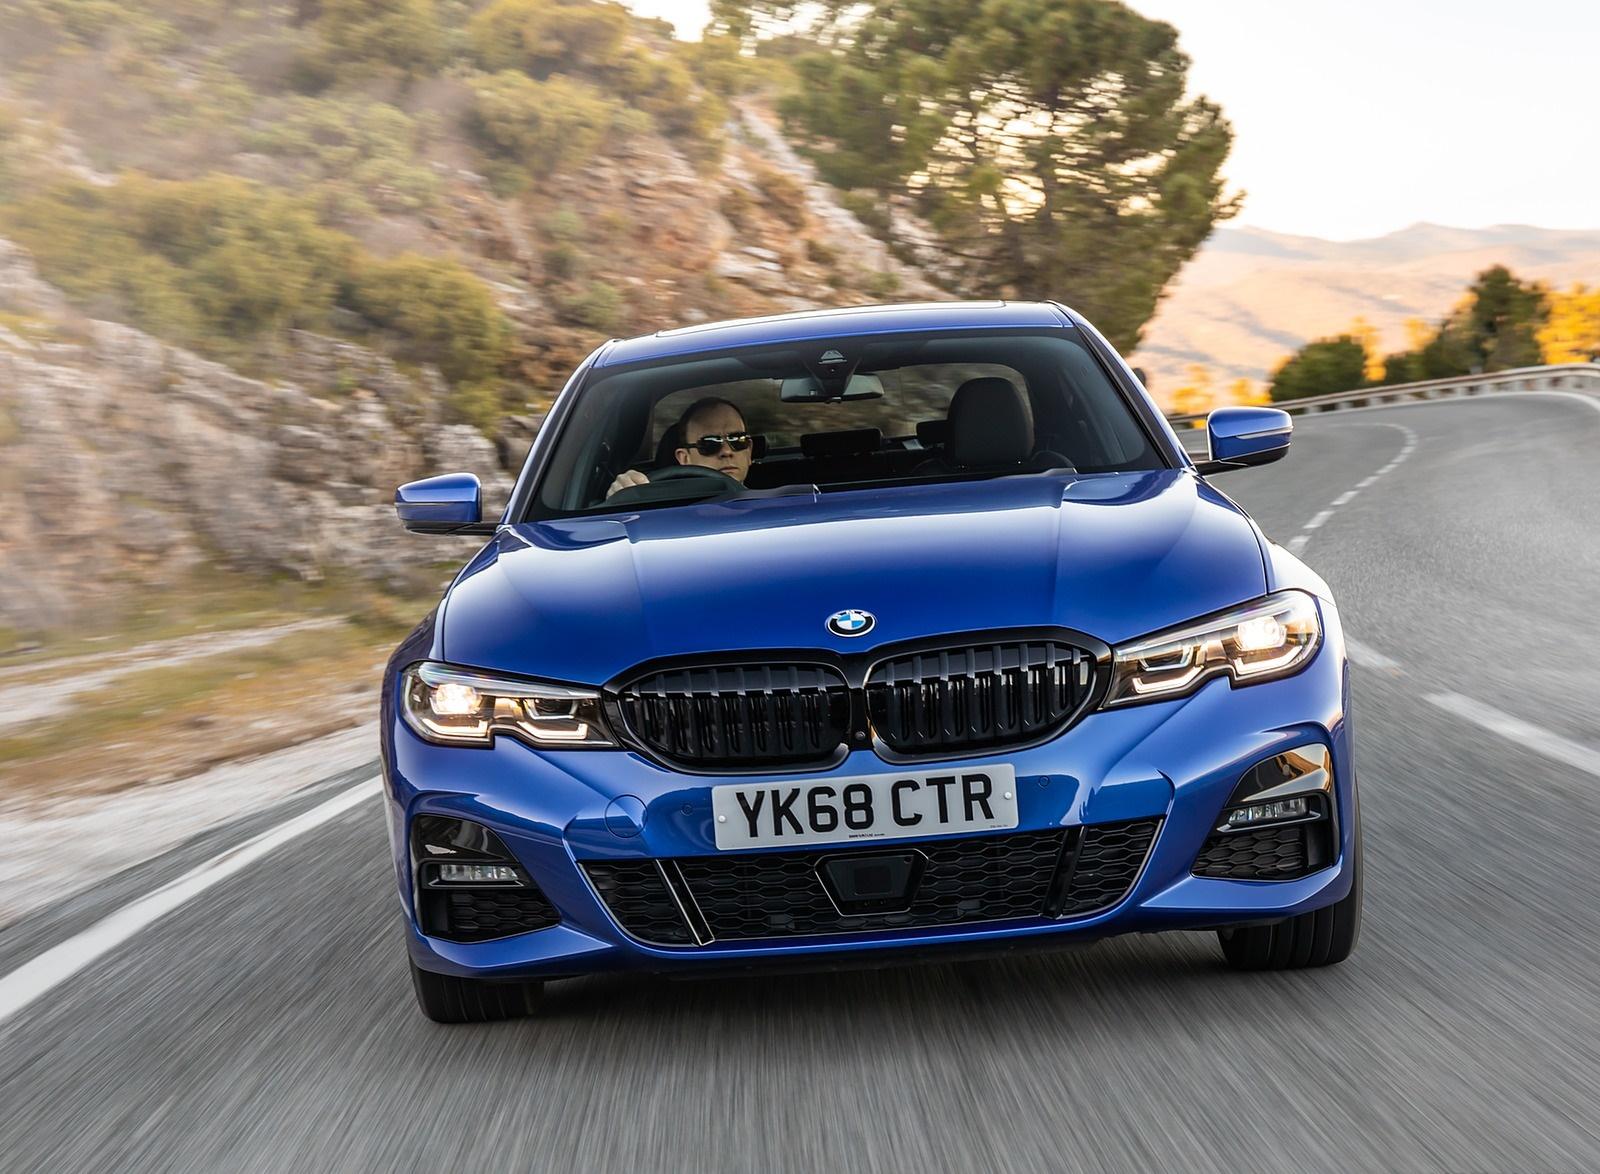 2019 BMW 3-Series Saloon 320d xDrive (UK-Spec) Front Wallpapers (11)